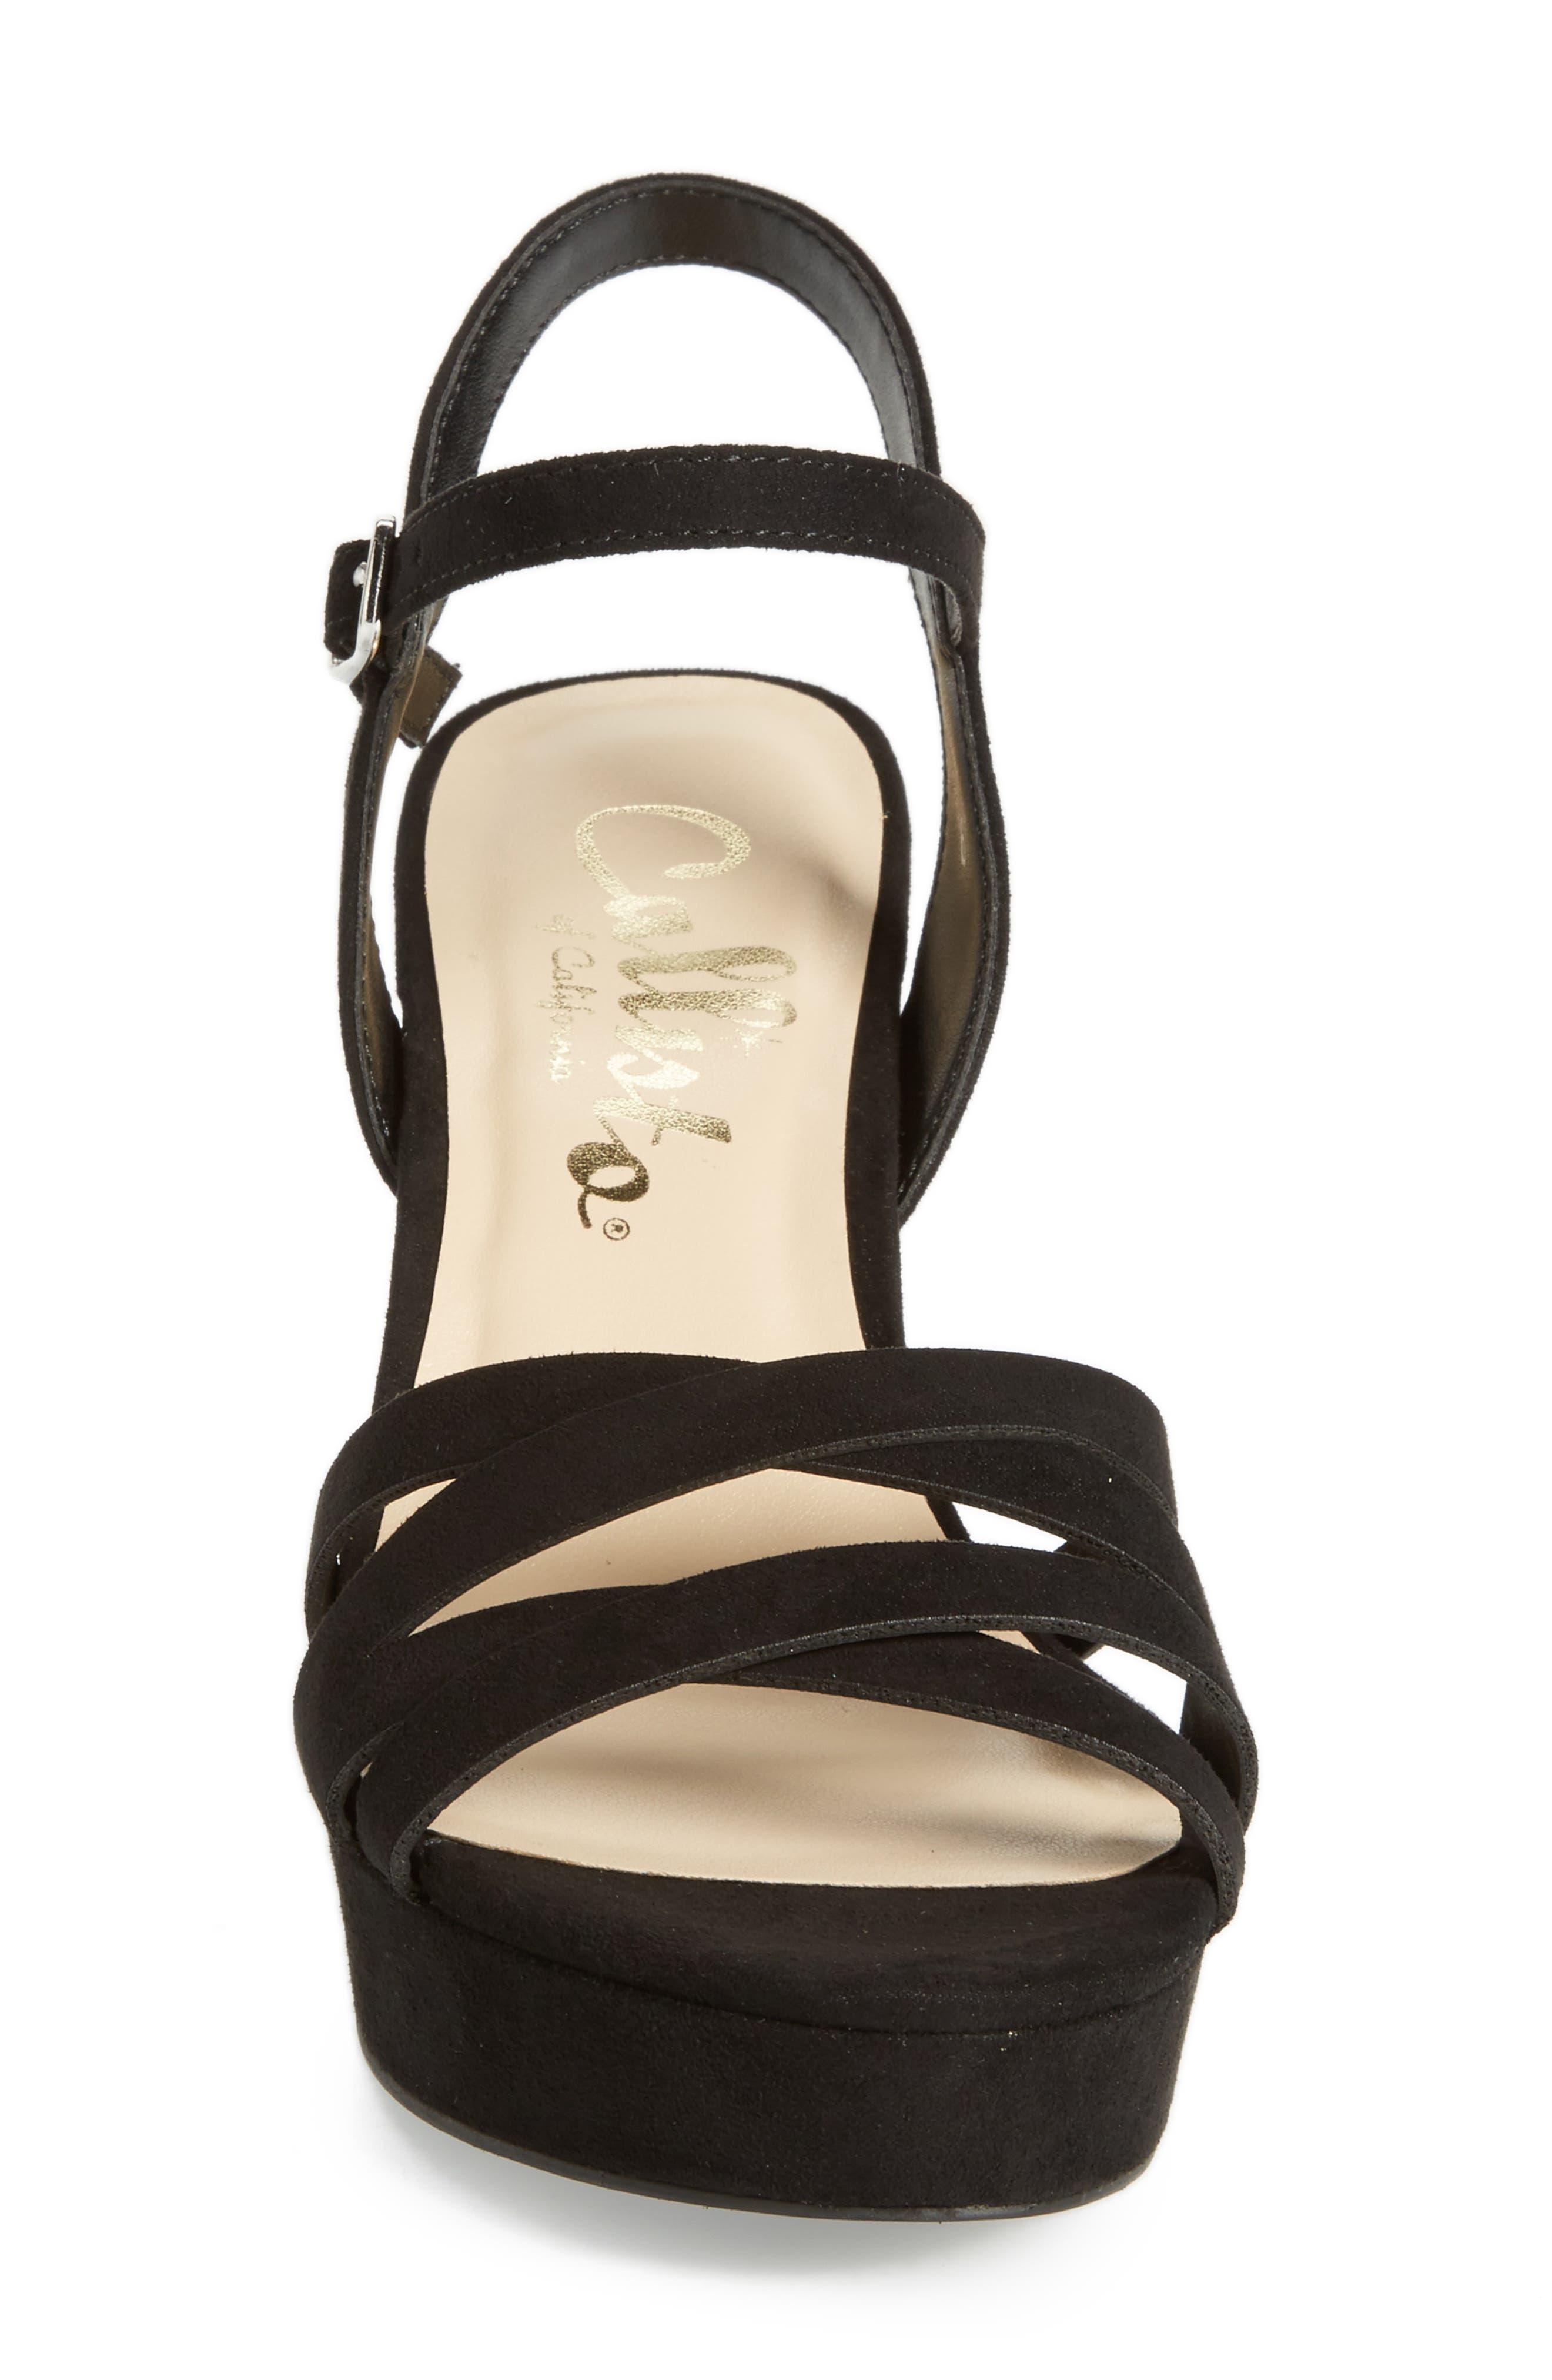 Paxx Platform Sandal,                             Alternate thumbnail 4, color,                             003